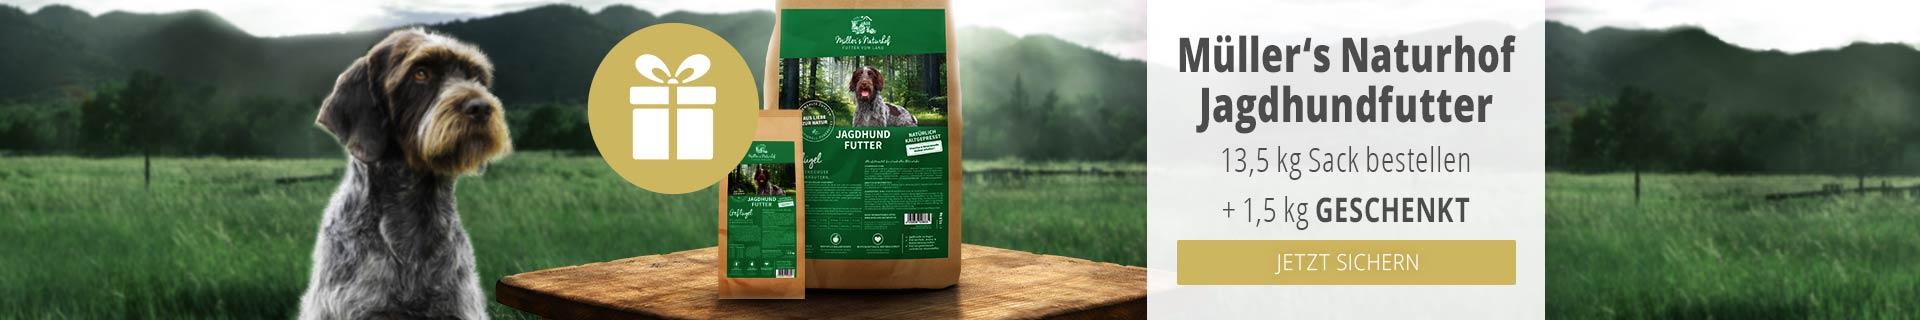 Müller's Naturhof Trockenfutter Aktion - 13,5kg Jagdhundfutter kaufen & 1,5kg derselben Sorte gratis erhalten